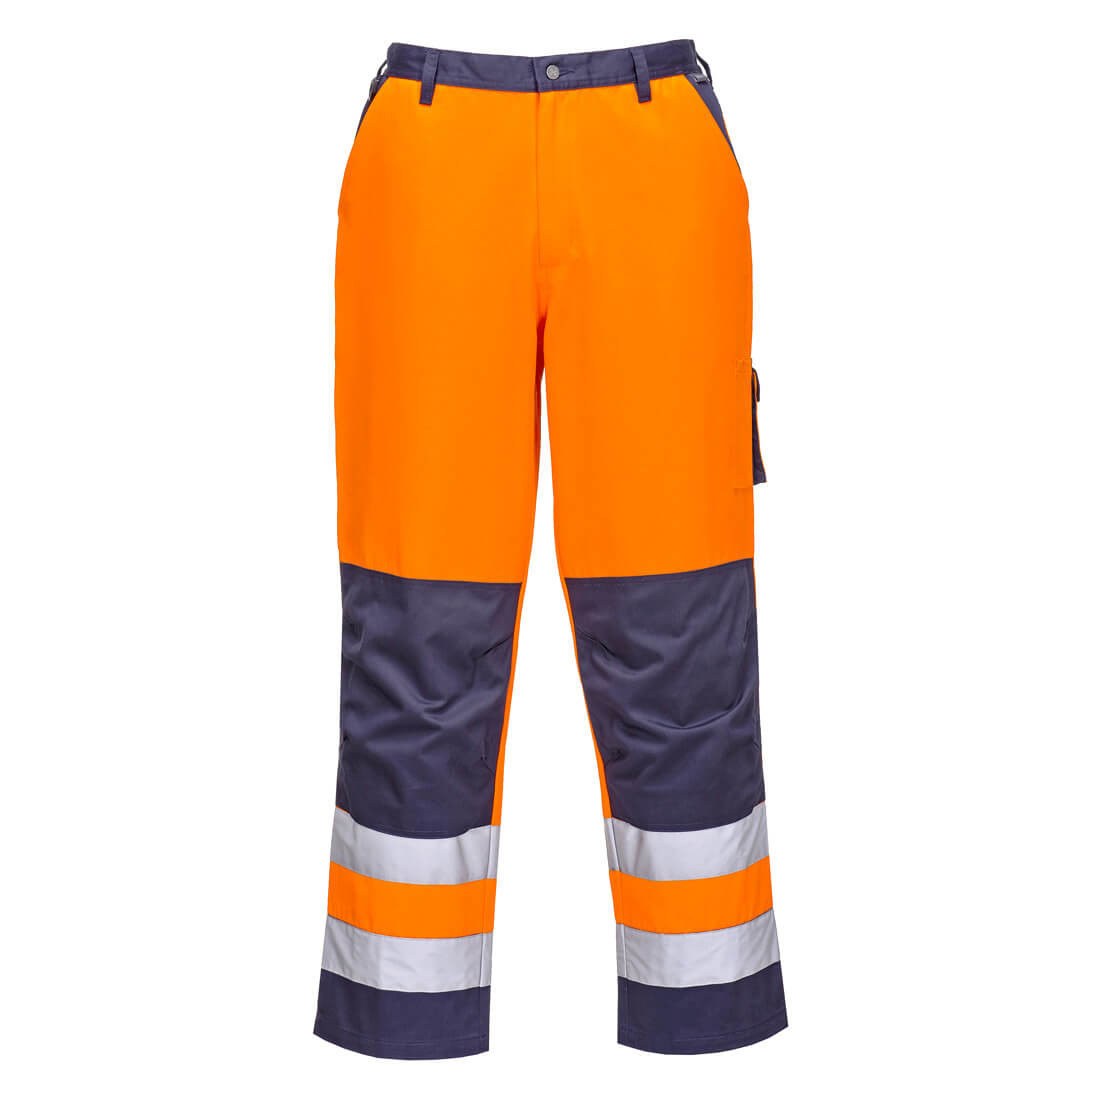 Pantaloni Lyon HiVis - Imbracaminte de protectie